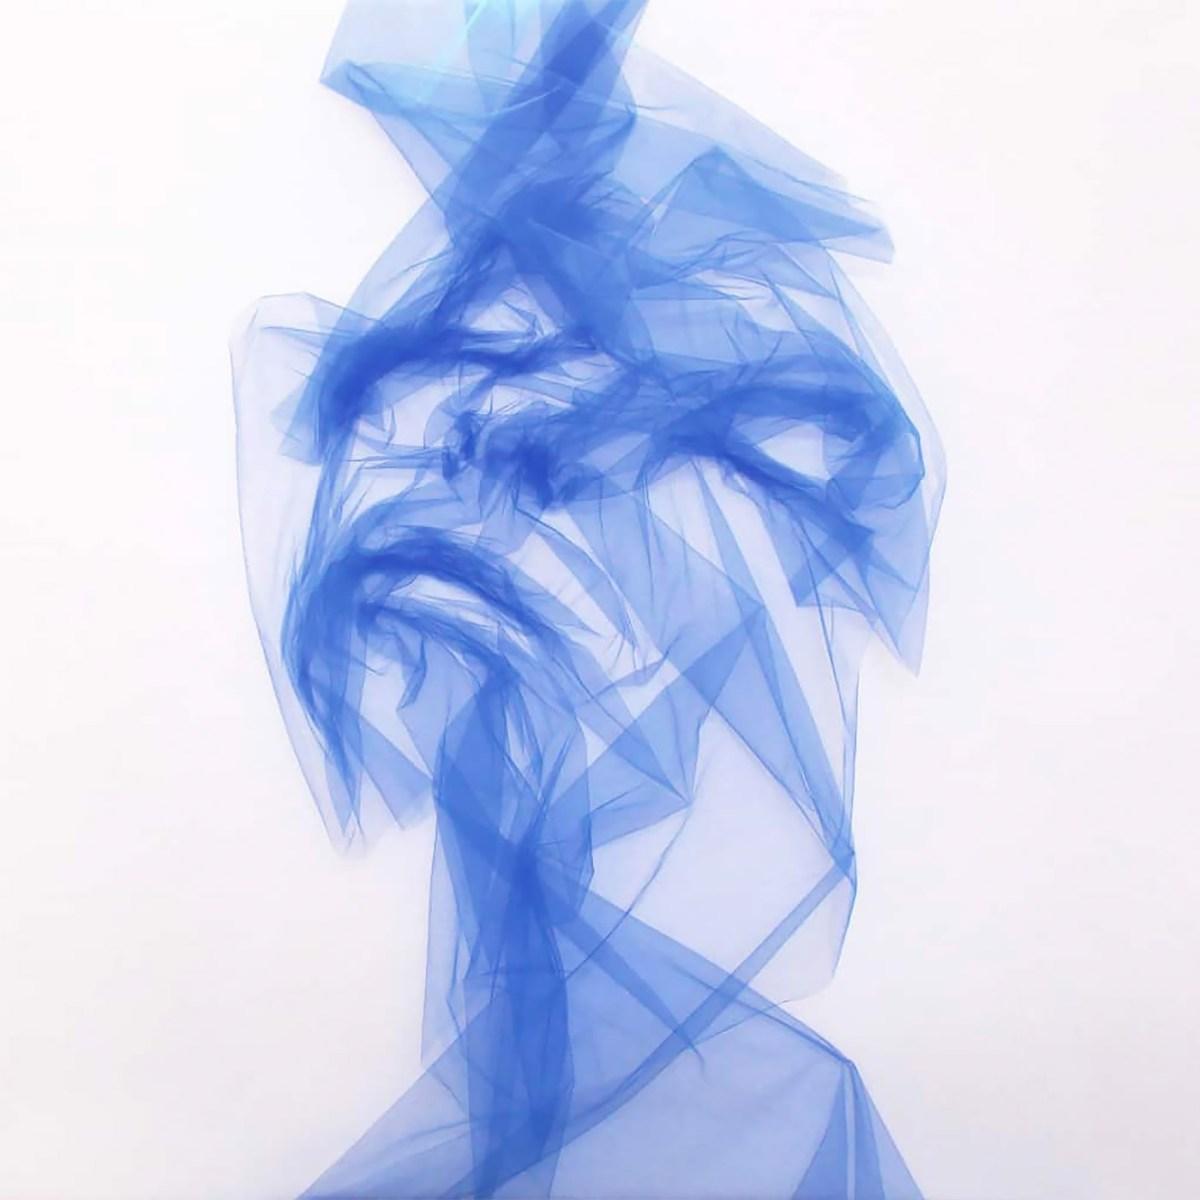 art-benjamin-shine-04